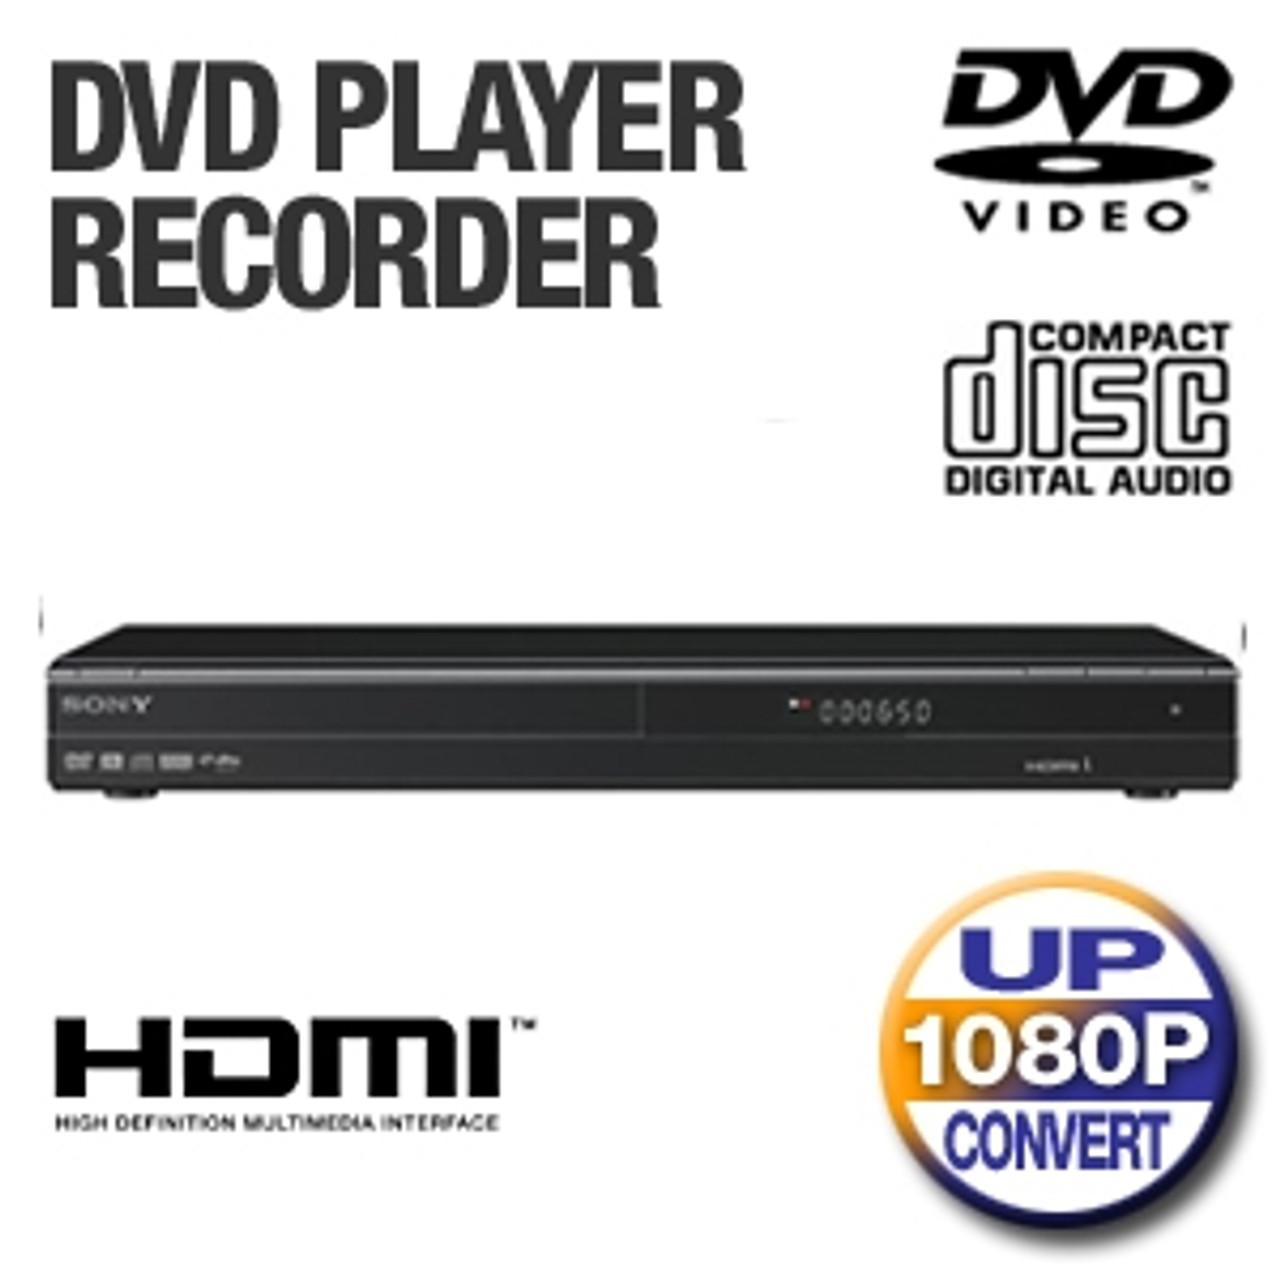 Sony RDR-GX257 DVD Recorder (HDMI)